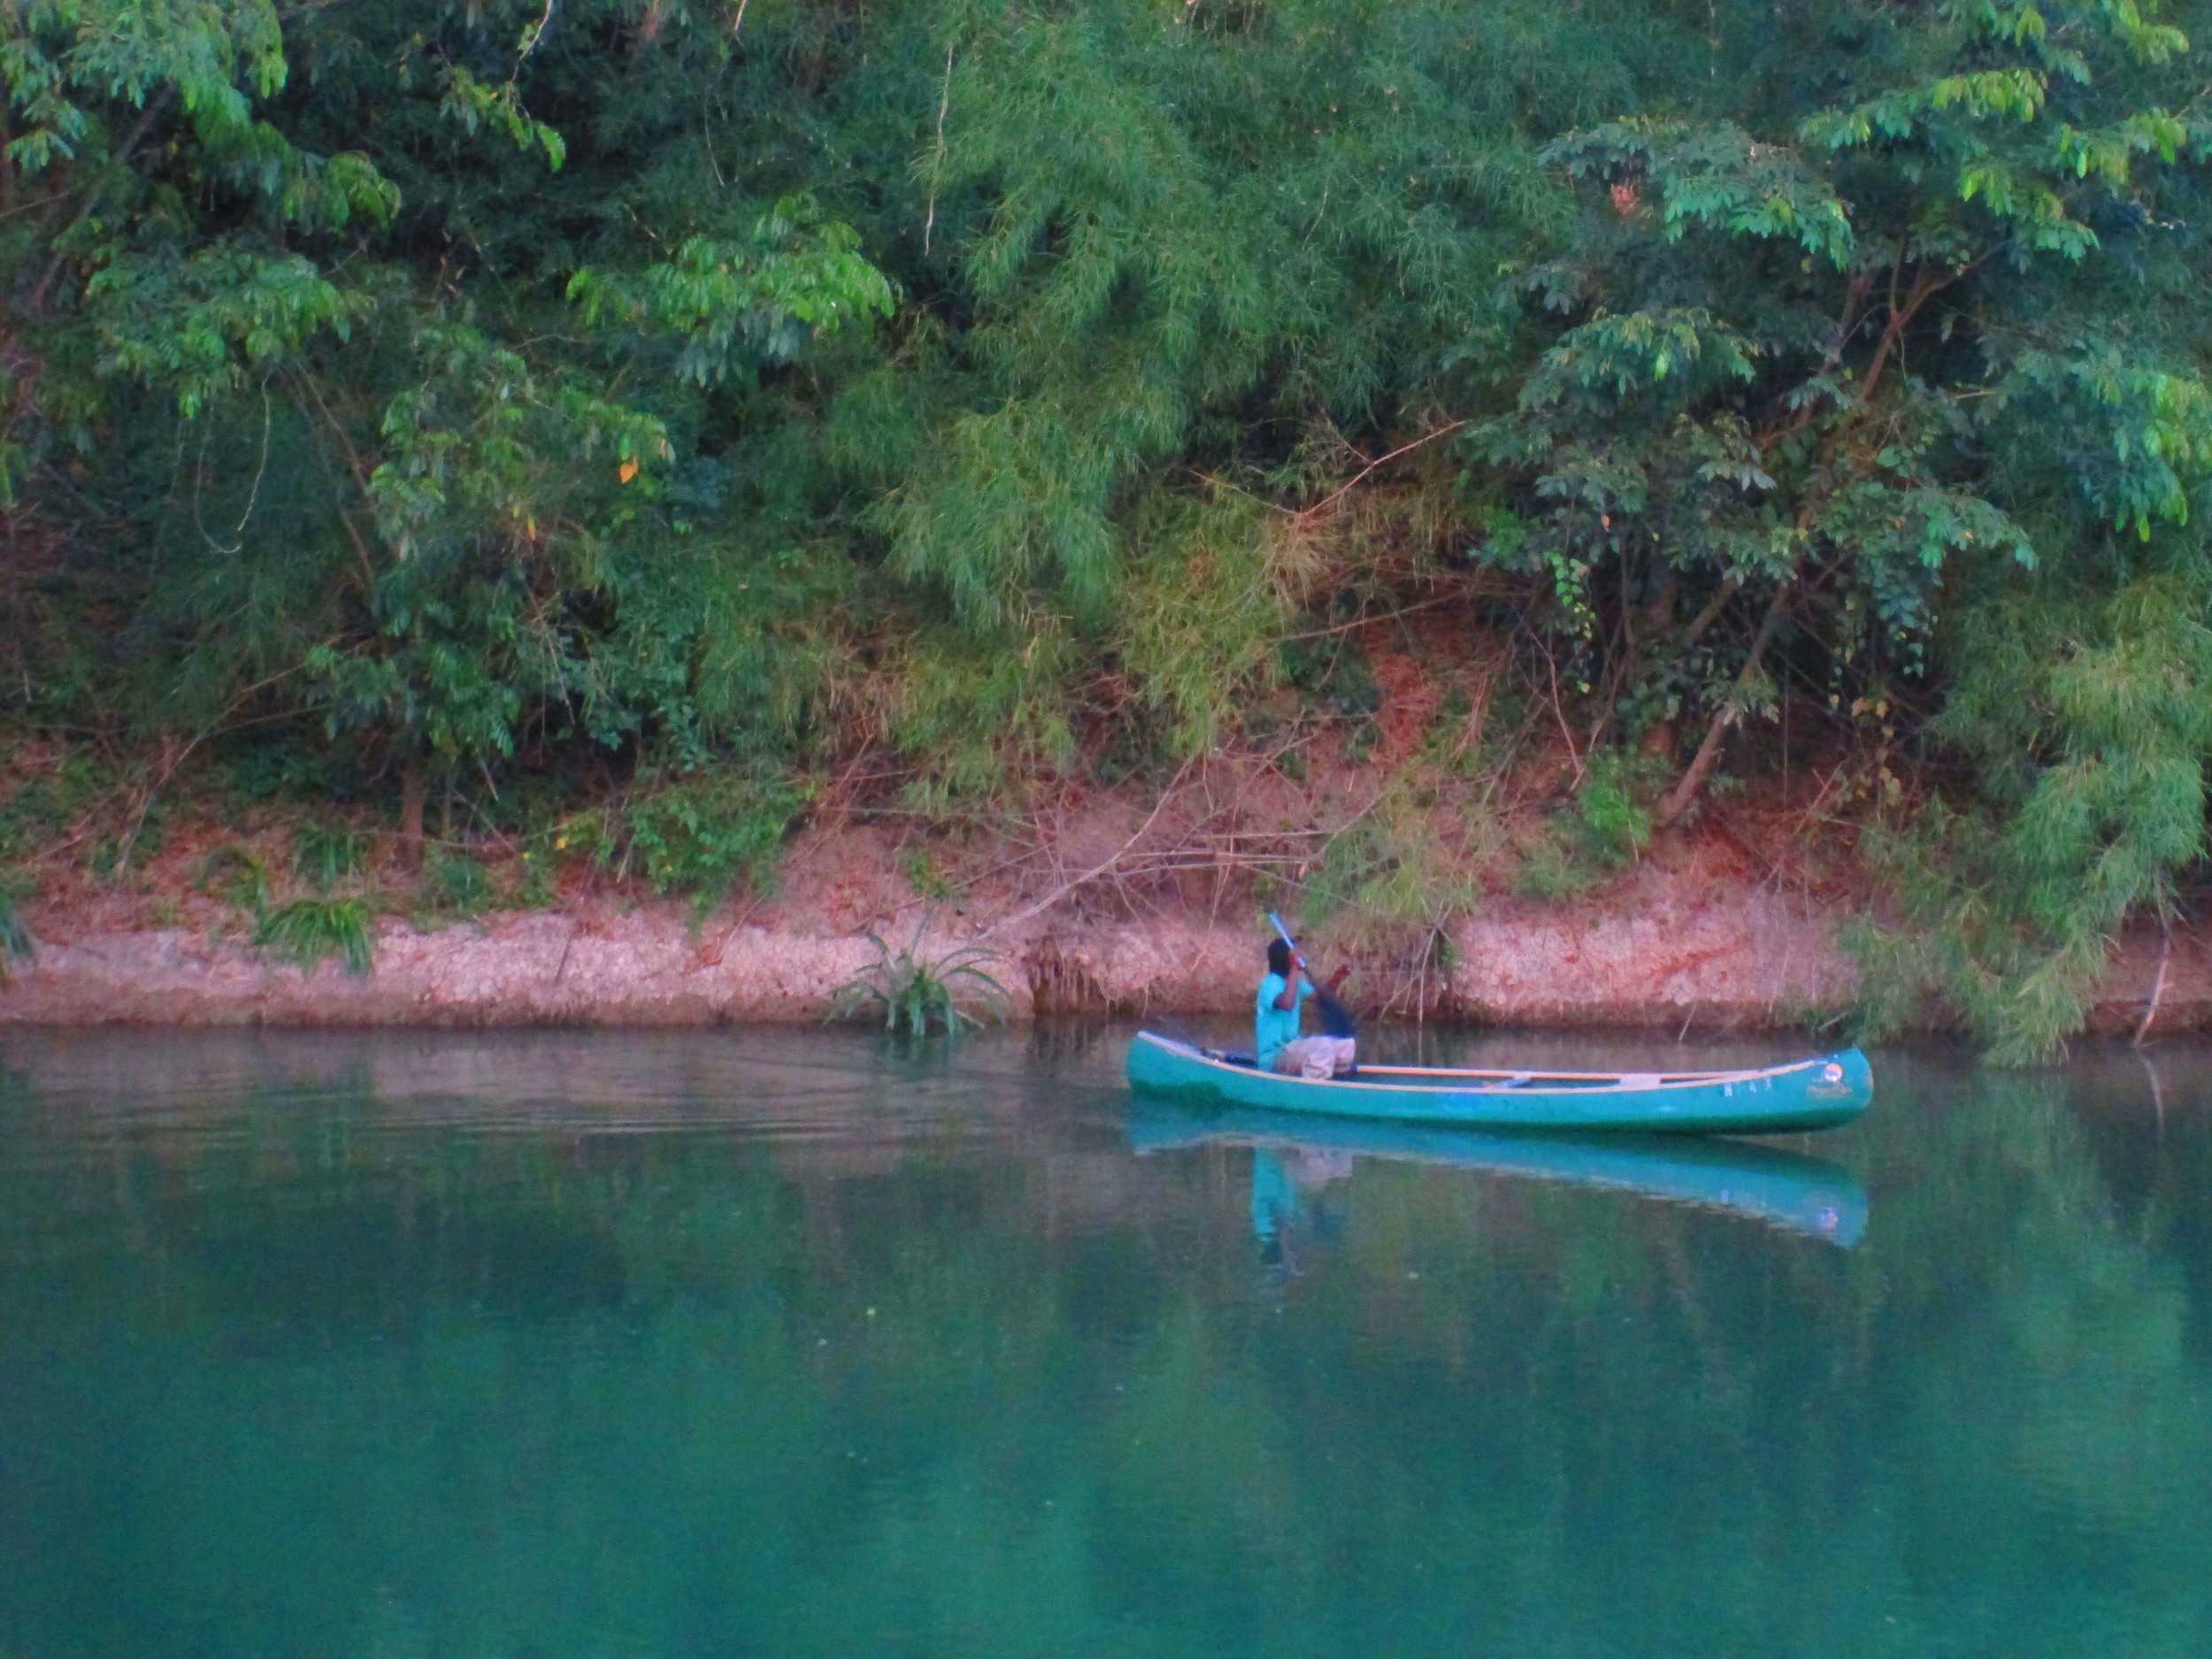 belize_fishing_canoeing.jpg